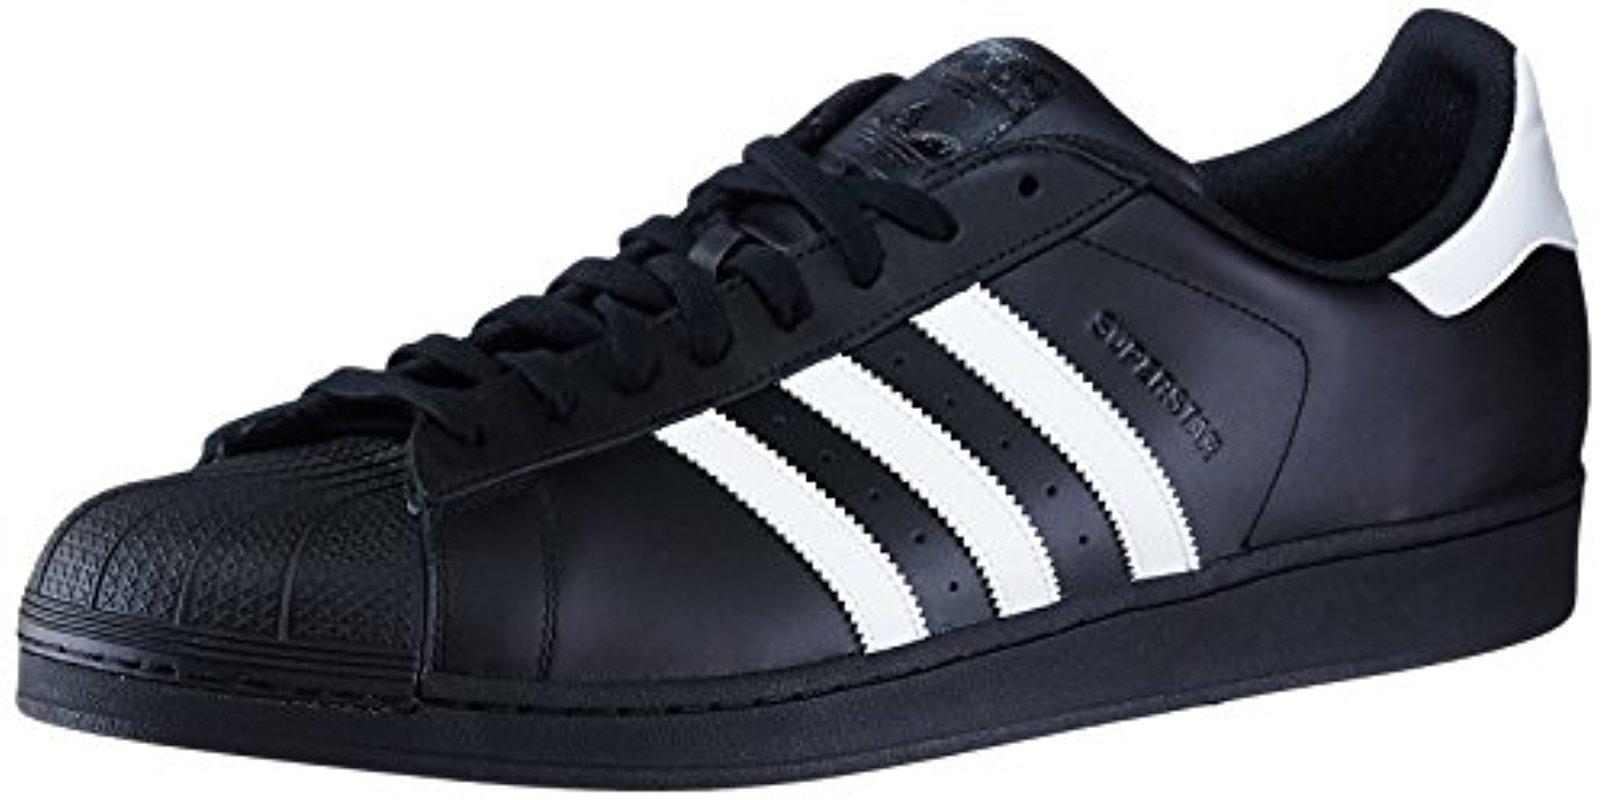 Lyst Lyst Lyst Adidas Originals Lyst Superstar de Foundation Zapatillas 4953b2